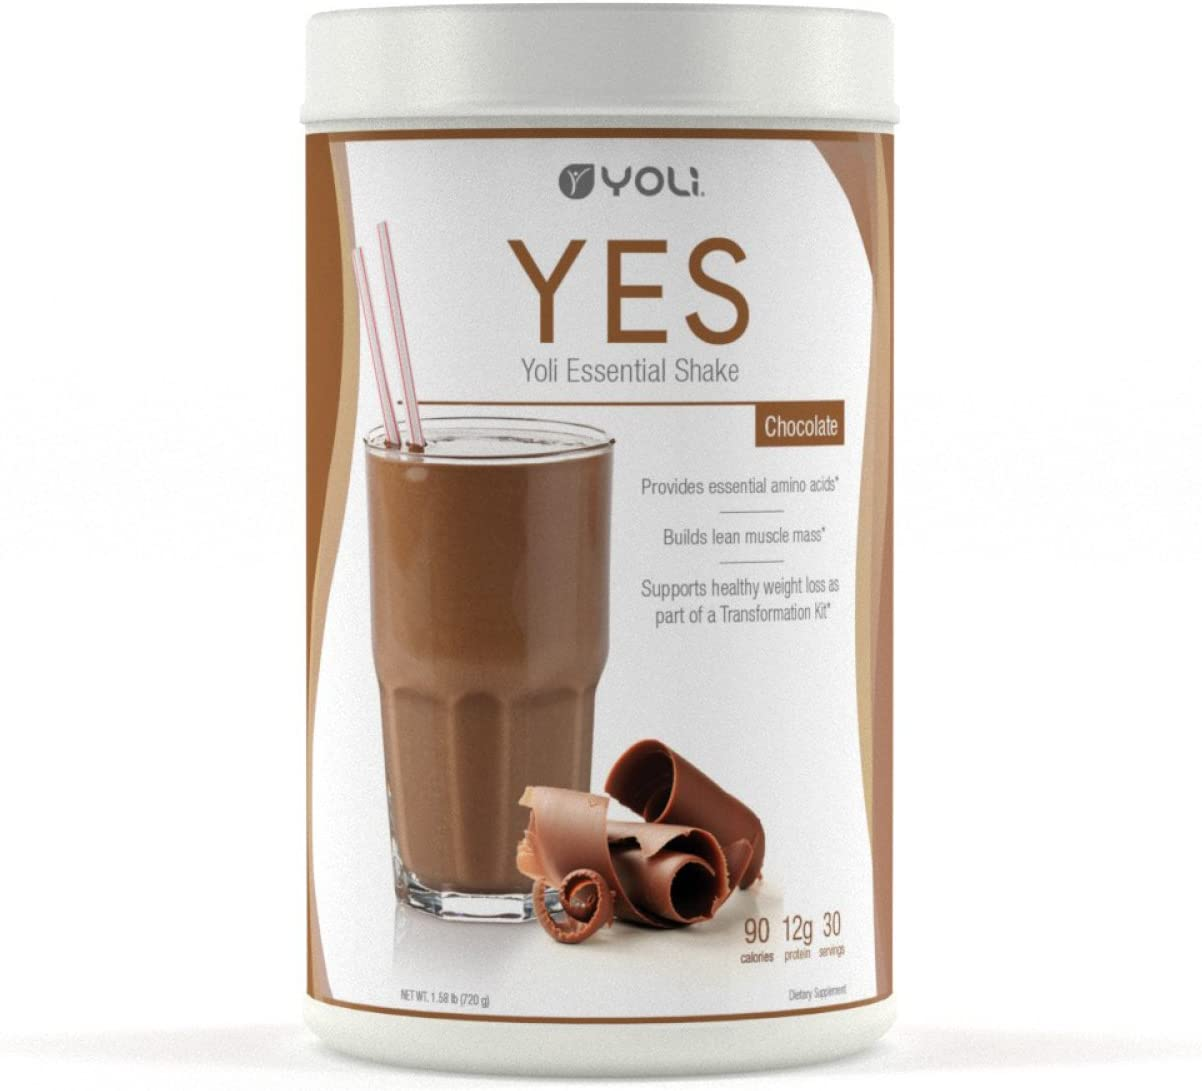 Award Yoli Tulsa Mall YES Protein Shake LLC by Chocolate Canister